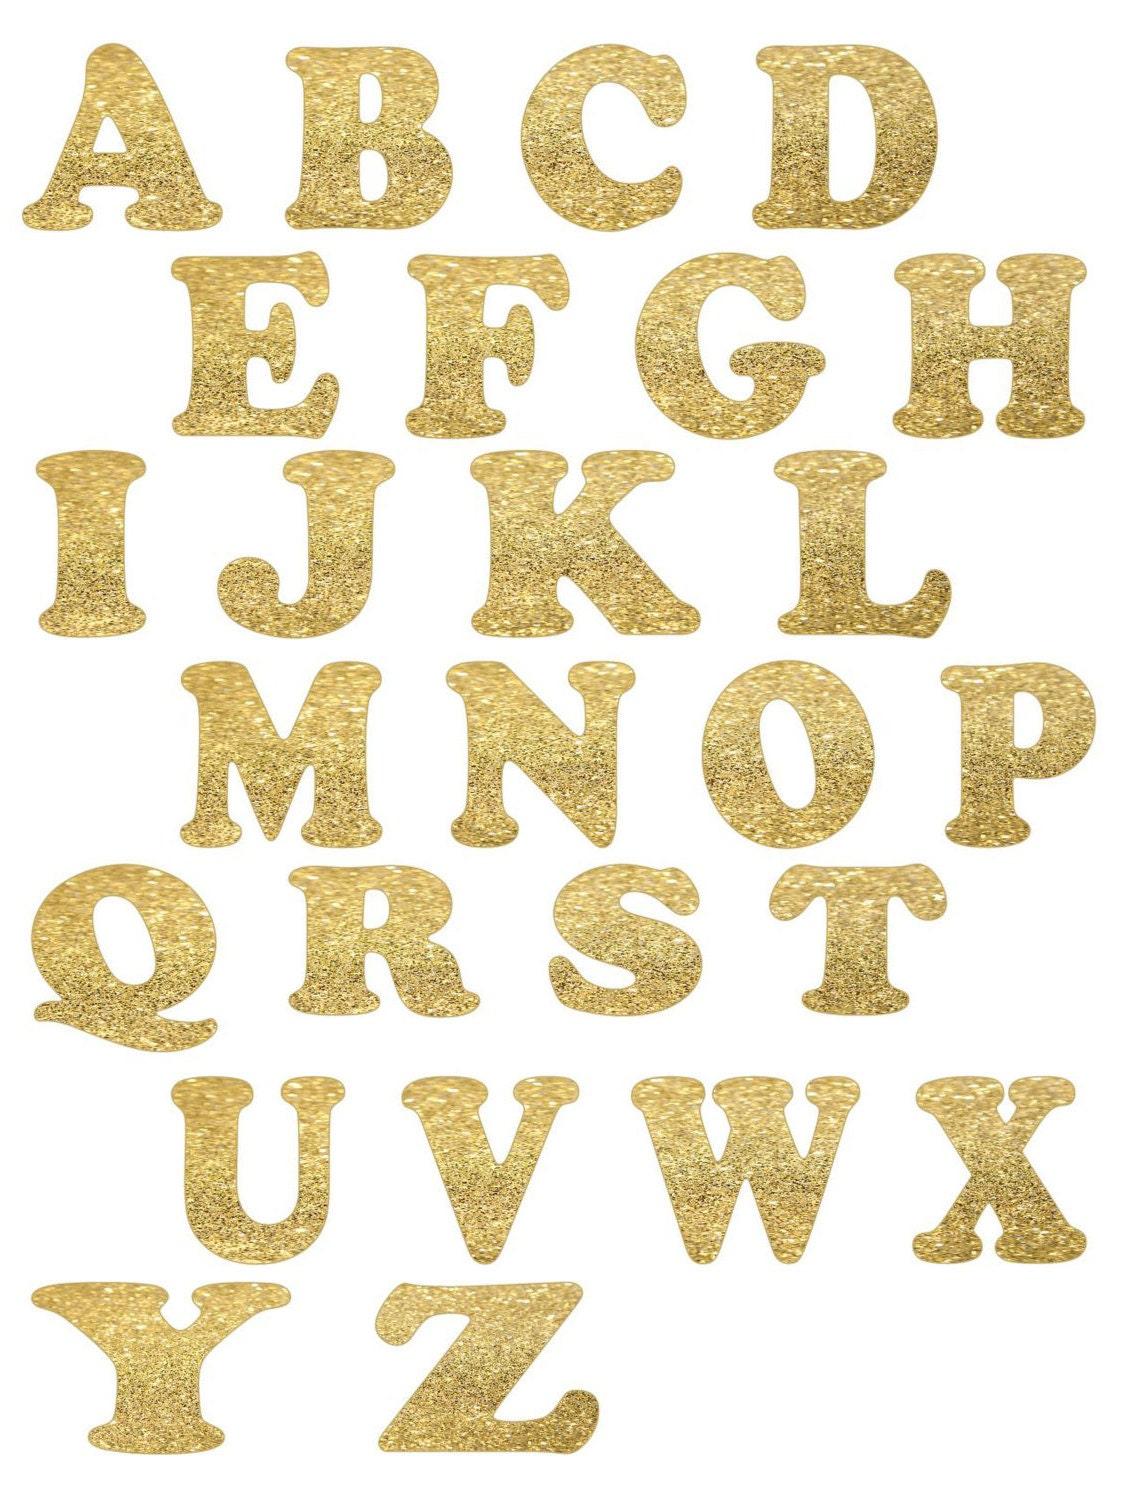 gold glitter alphabet letters die cut letters 26 letters With gold die cut letters